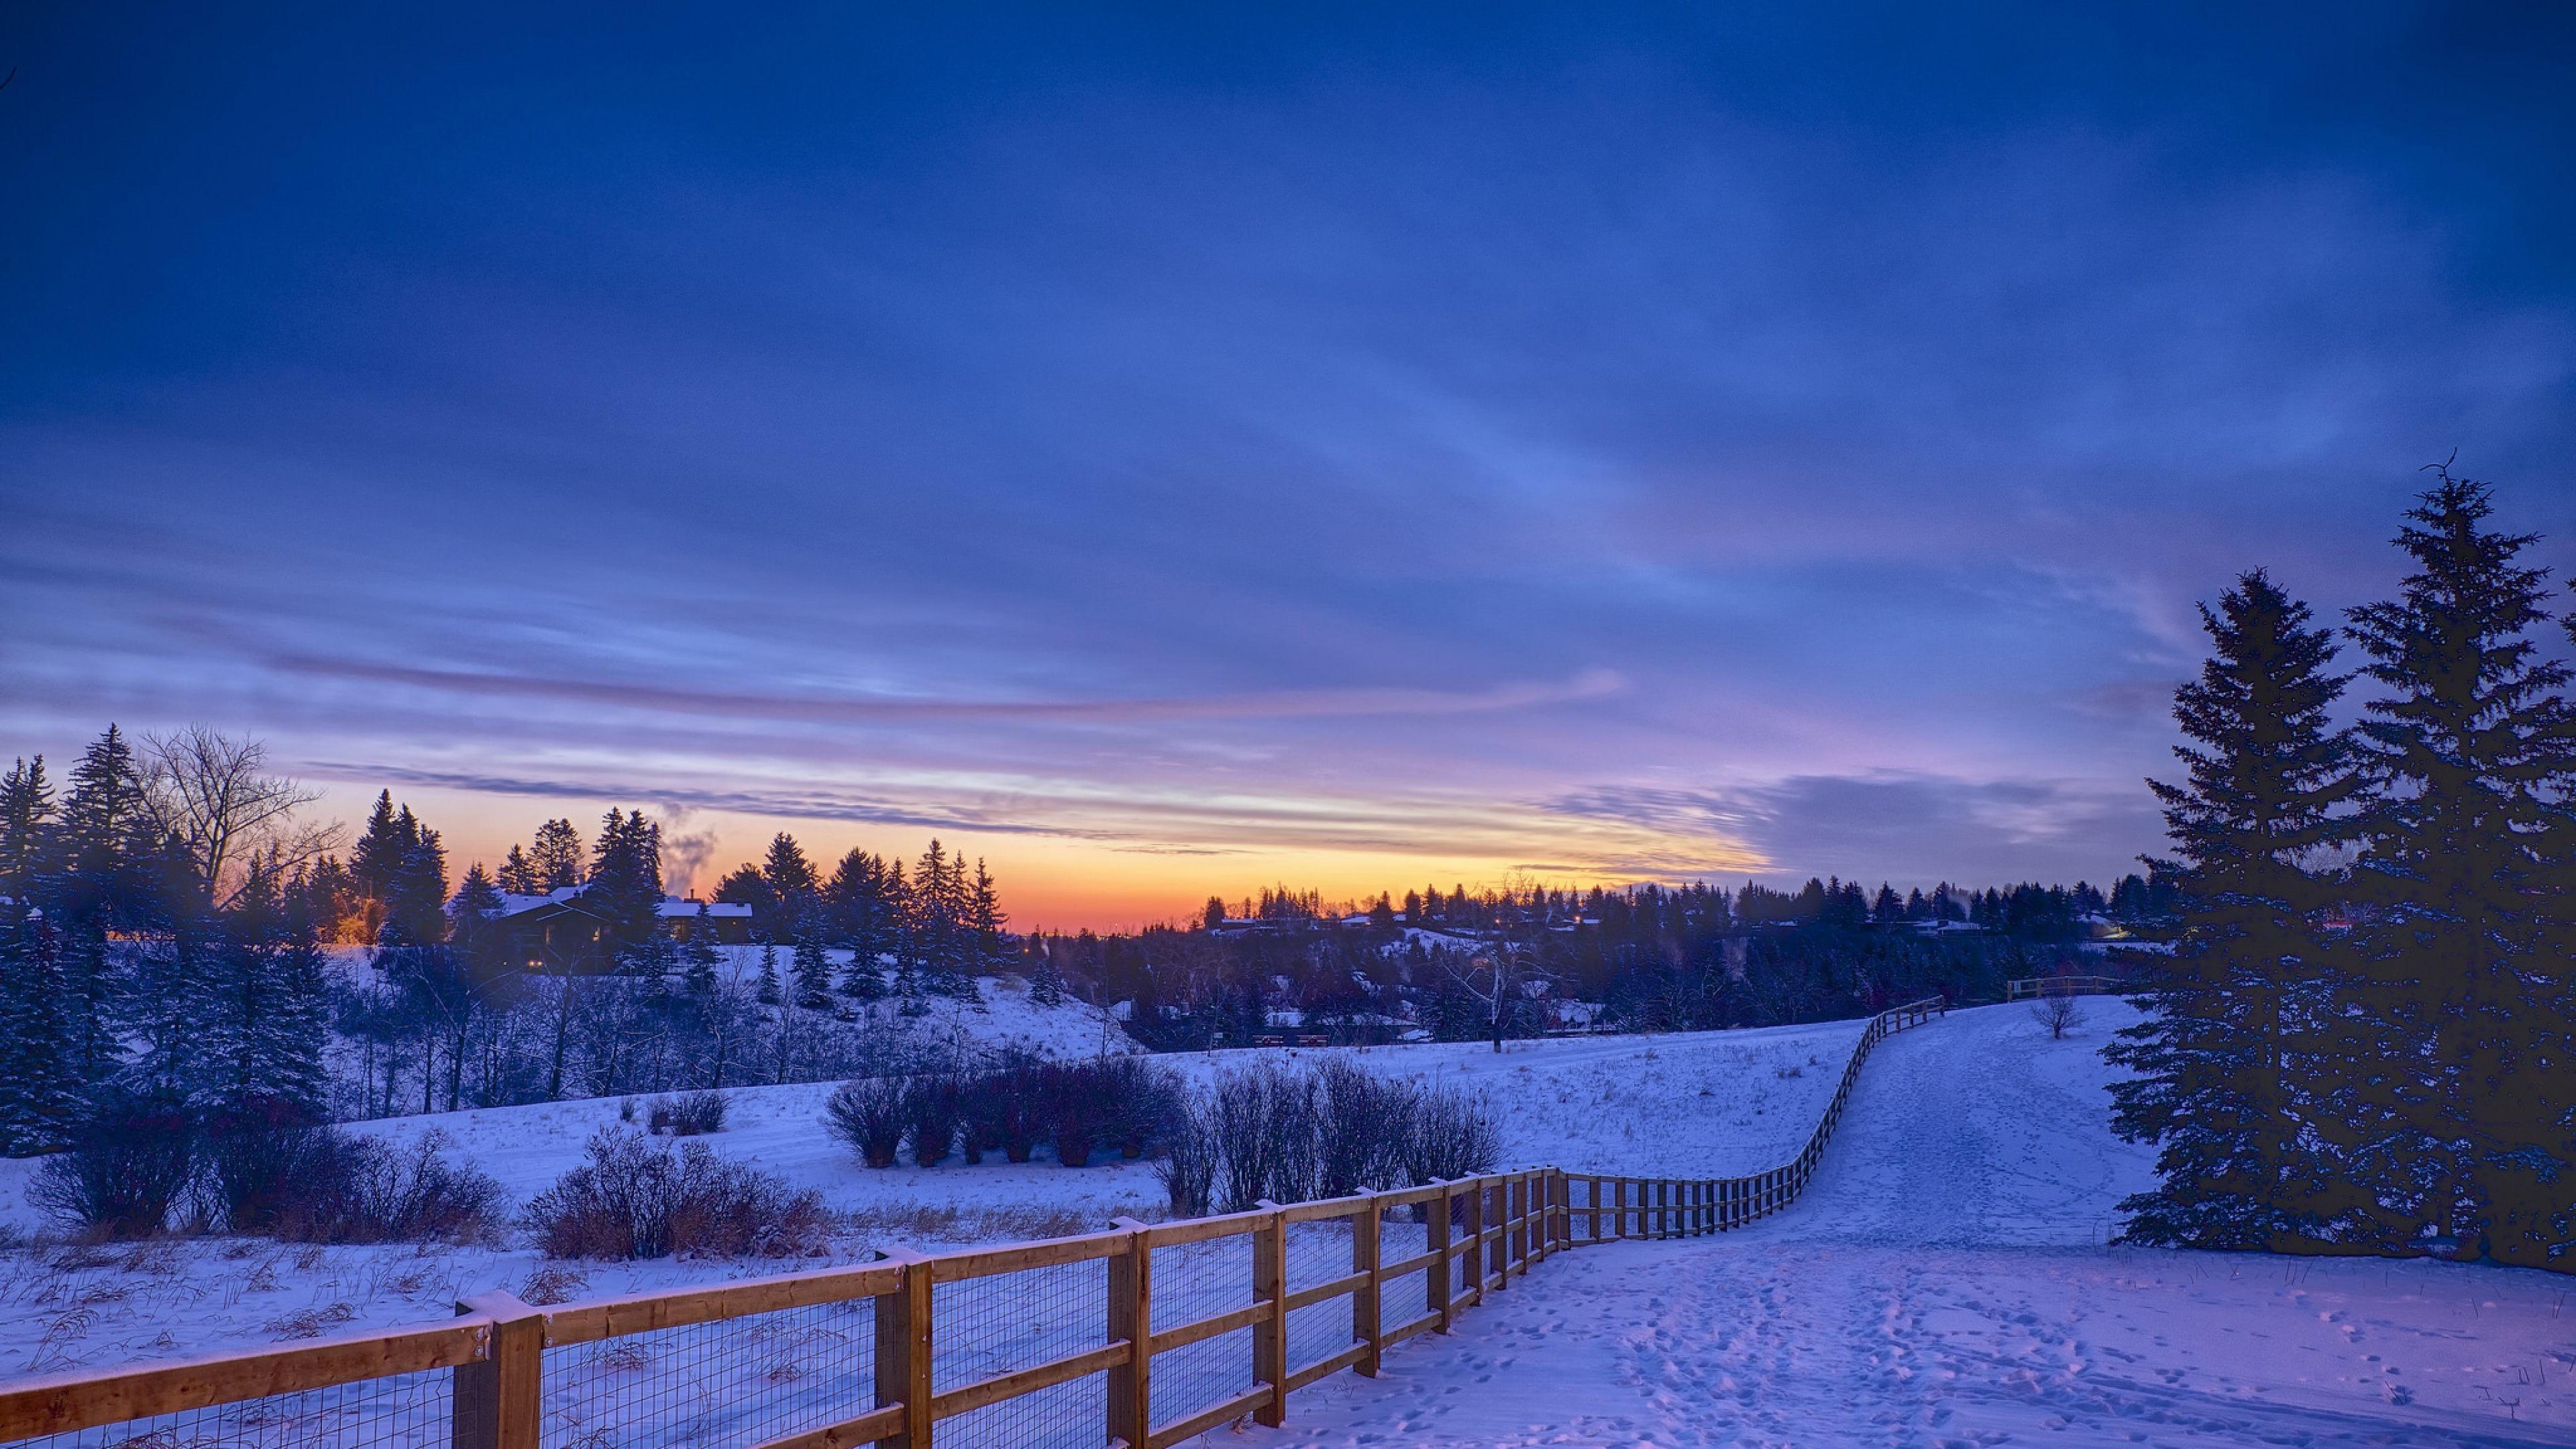 4K Snow Wallpaper (23+ images)